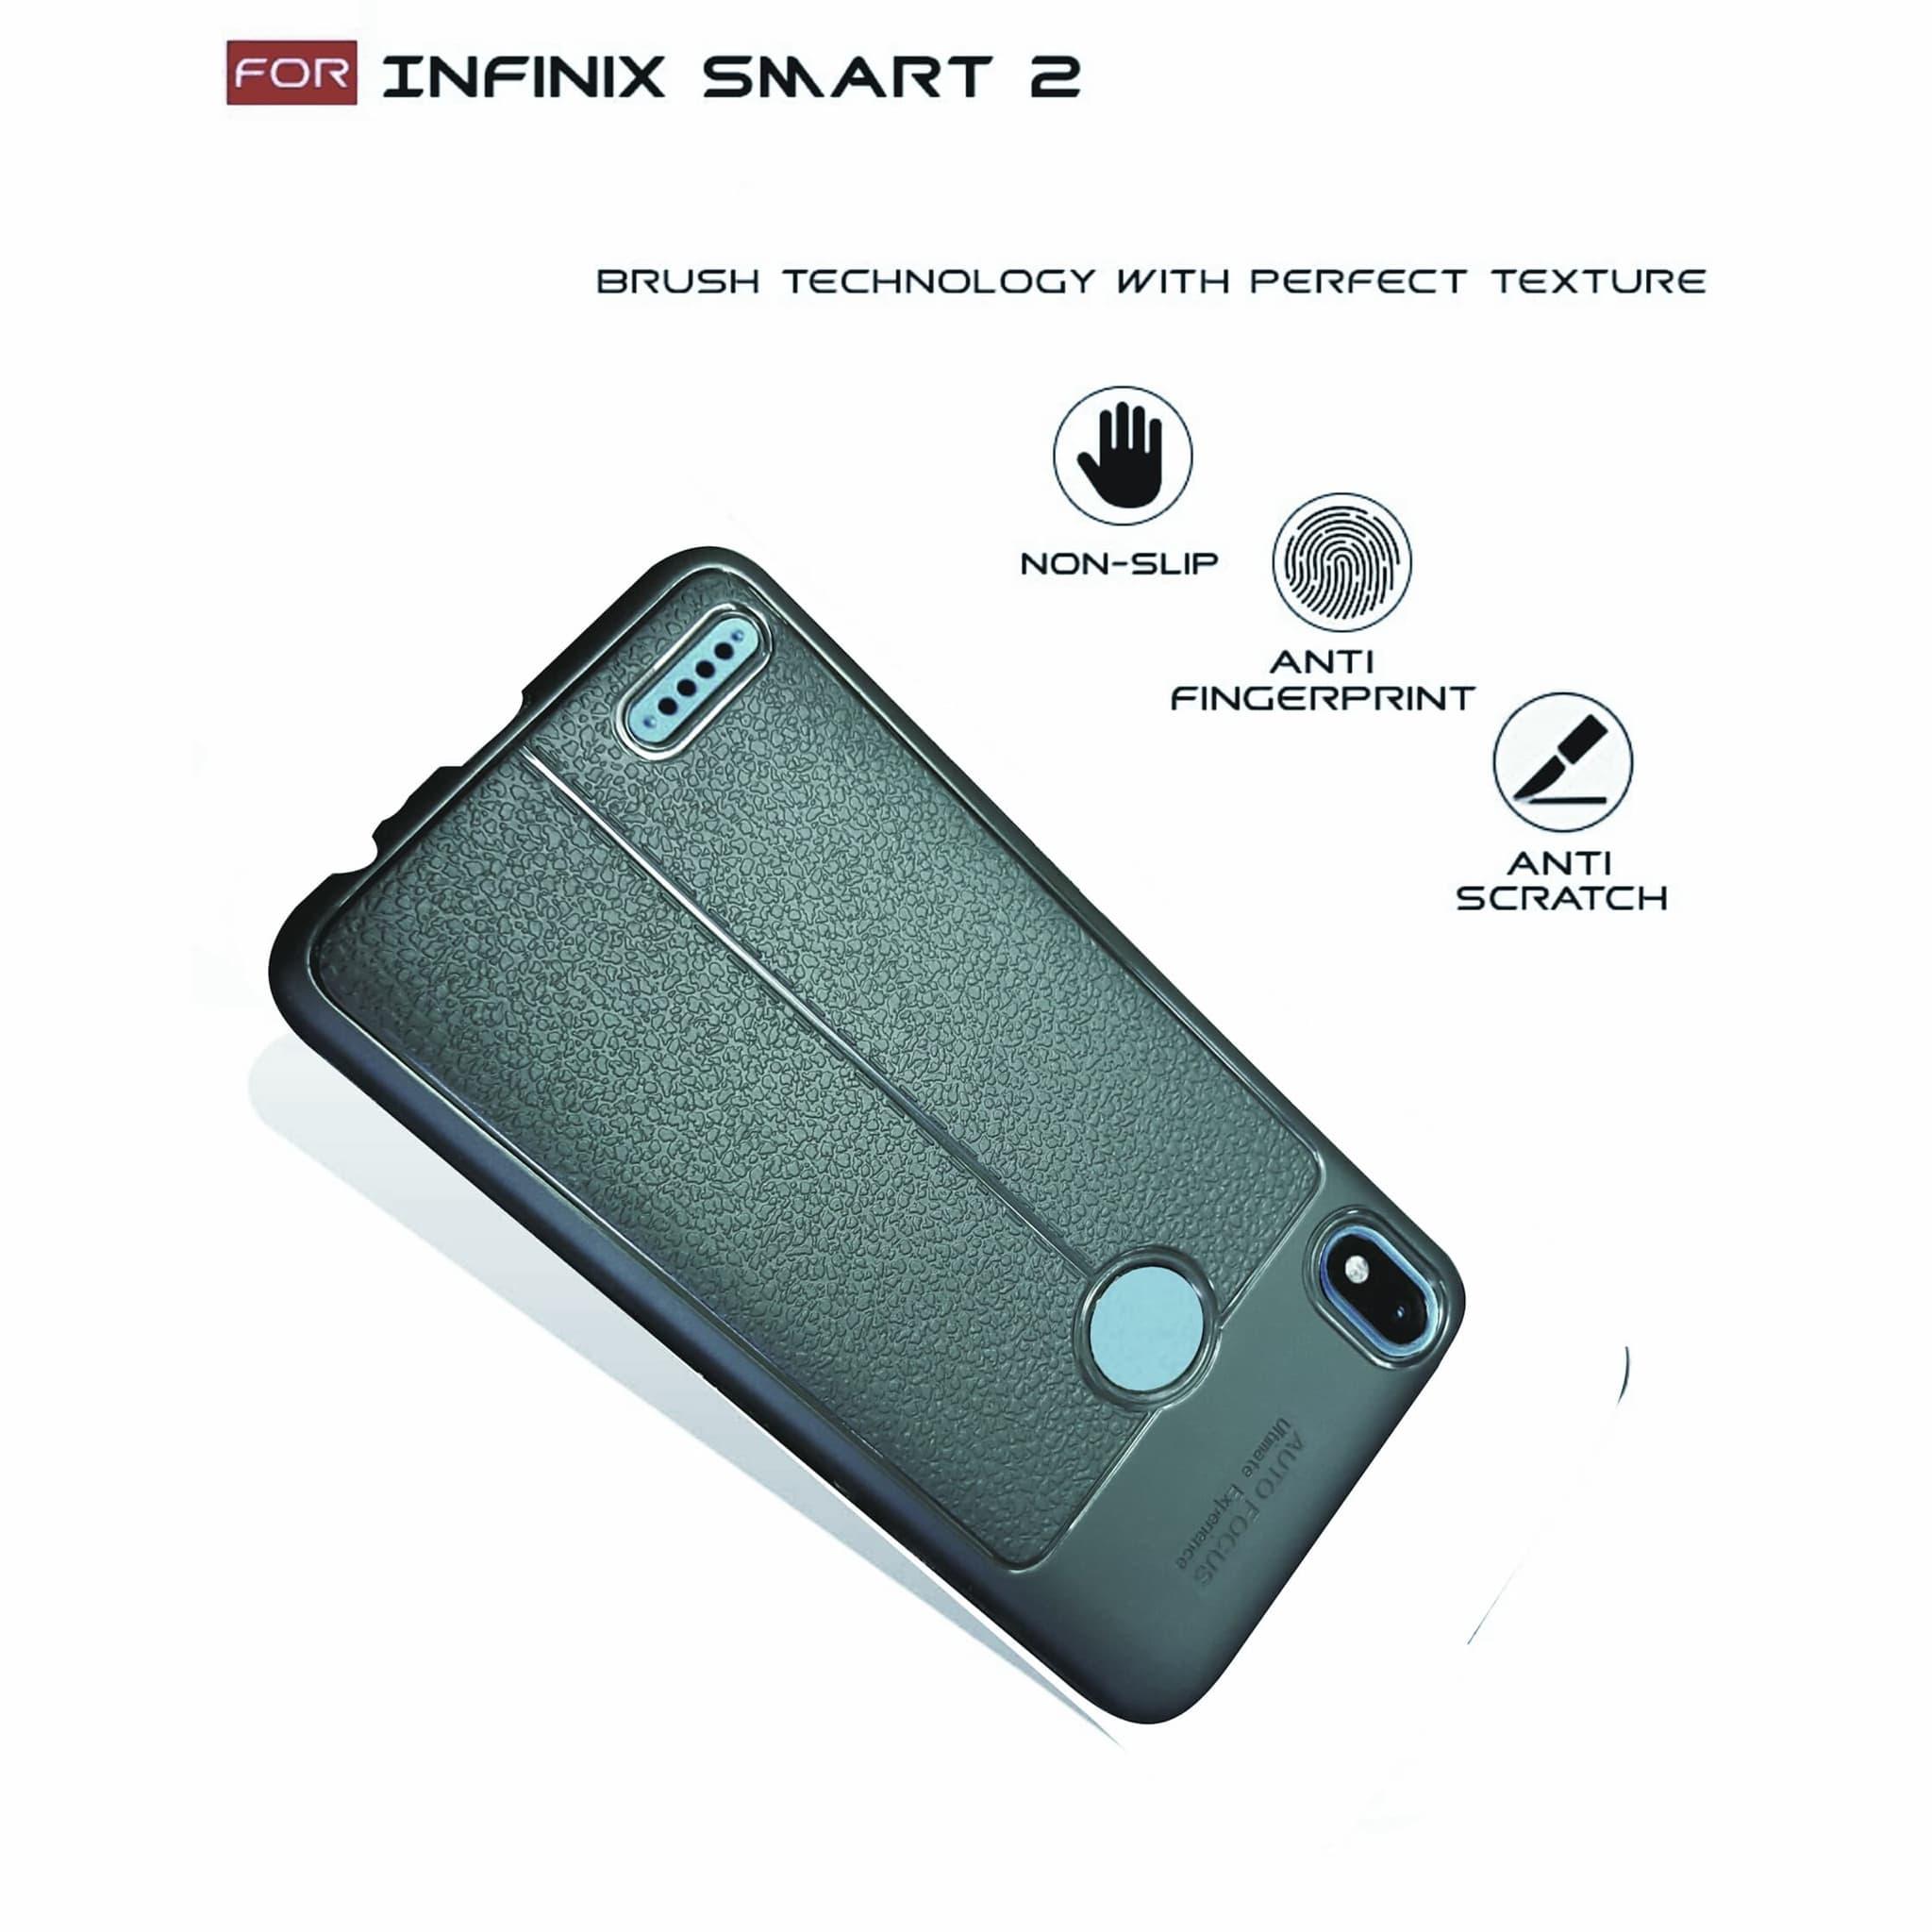 Jual Softcase Infinix Smart 2 X5515f Lichee Case Fitur Mr 360 Note 4 Pro X571